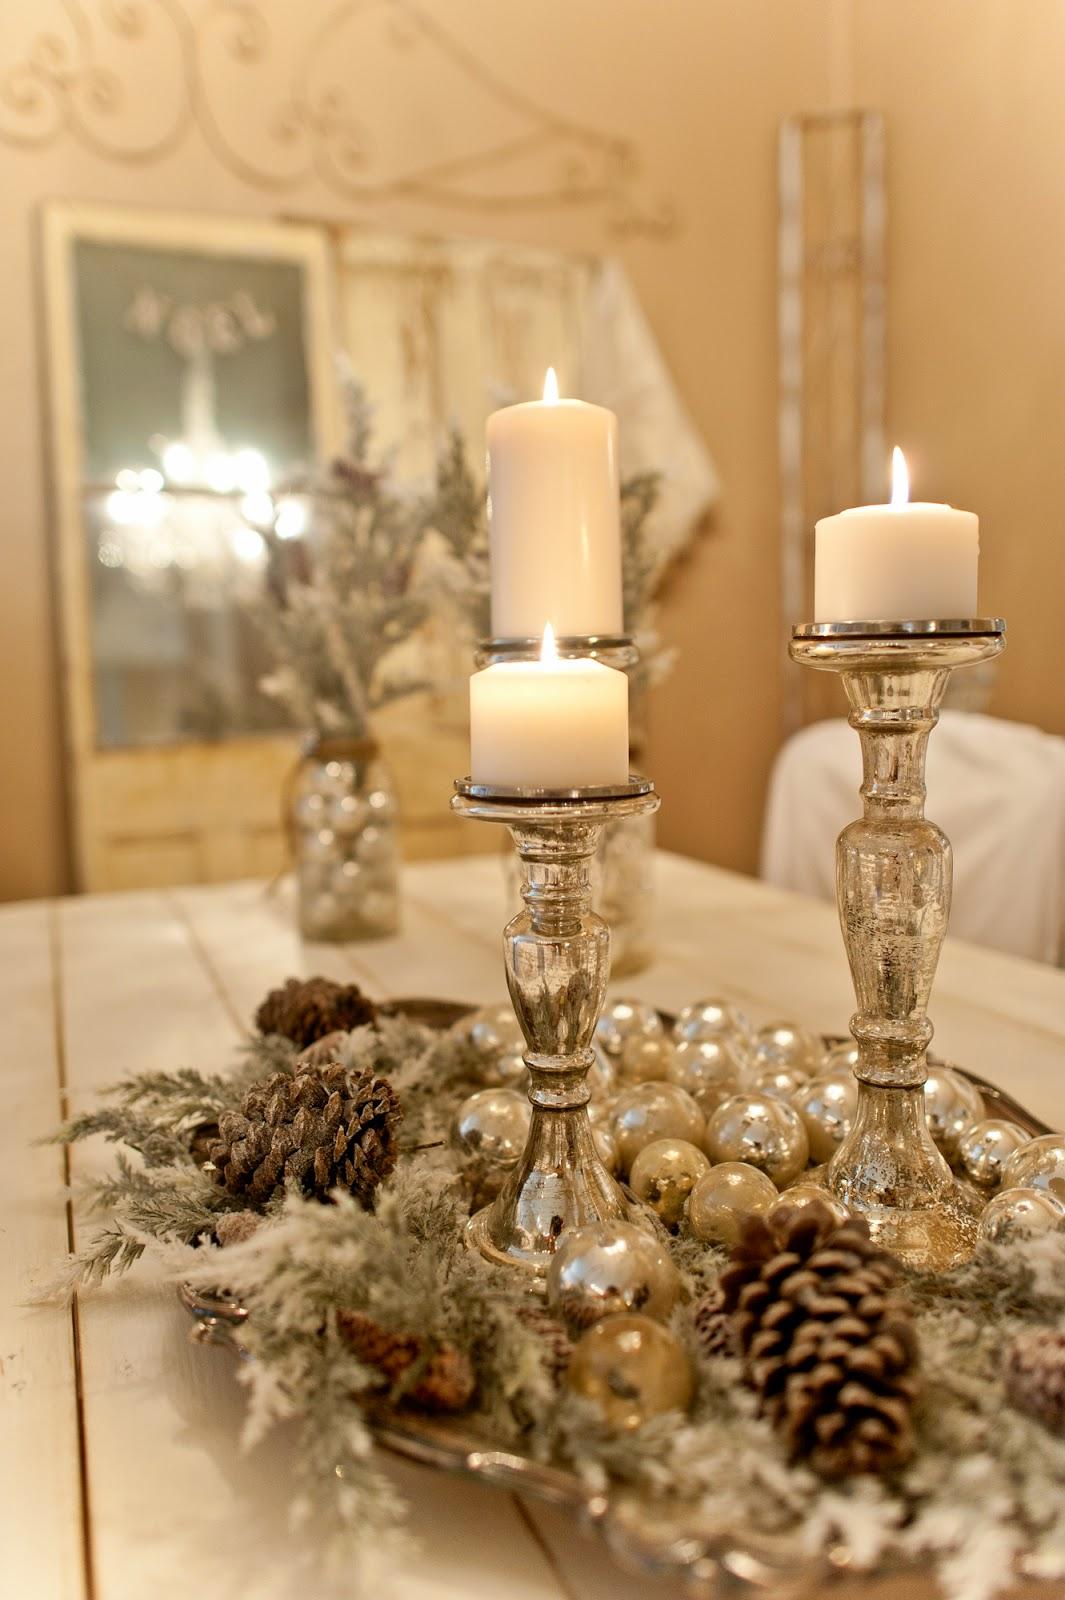 Best Decoration Ideas: 50 Best DIY Christmas Table Decoration Ideas For 2019